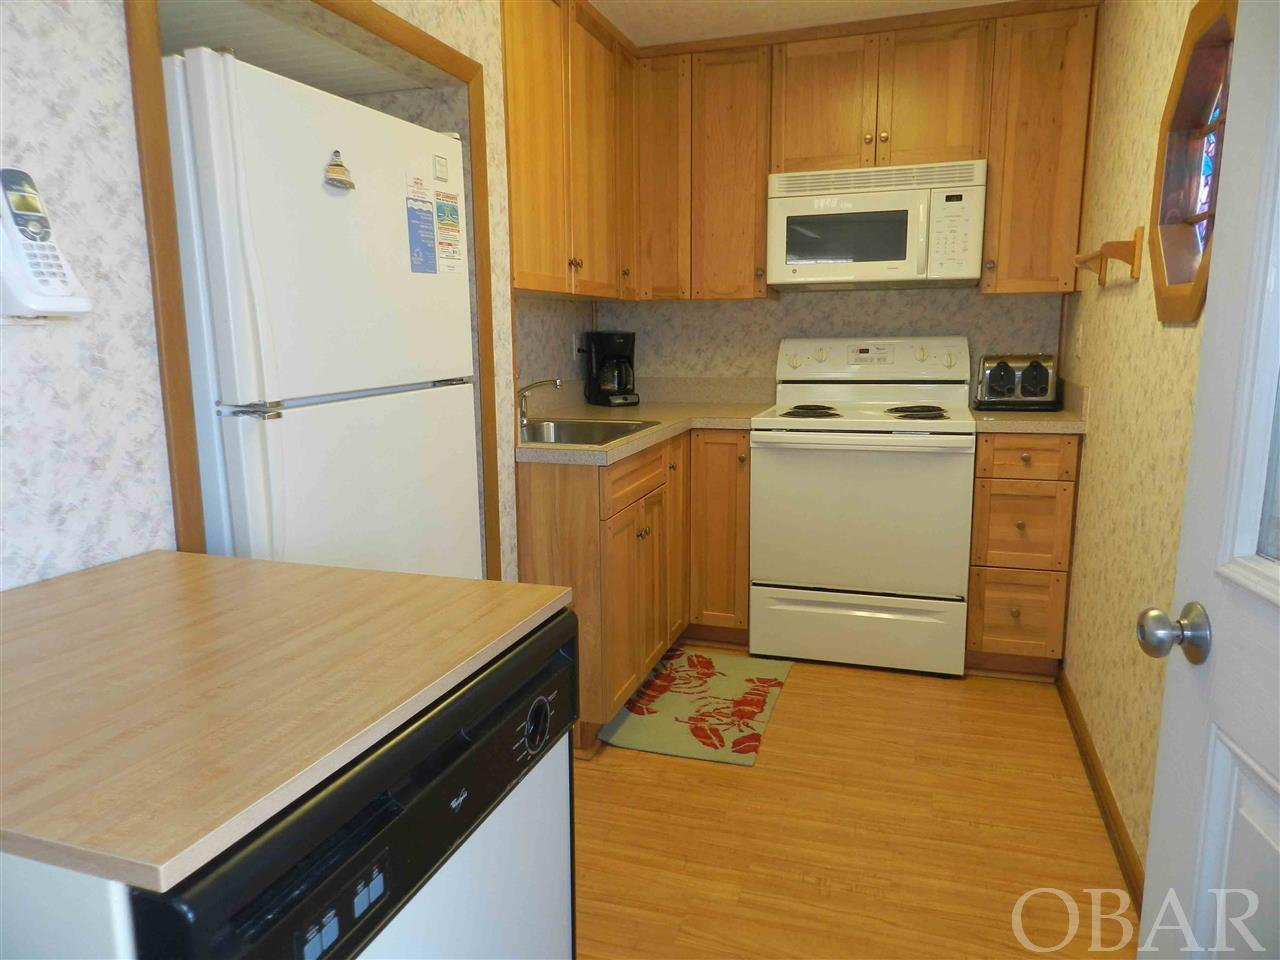 5615 Virginia Dare Trail,Nags Head,NC 27959,2 Bedrooms Bedrooms,1 BathroomBathrooms,Residential,Virginia Dare Trail,97366